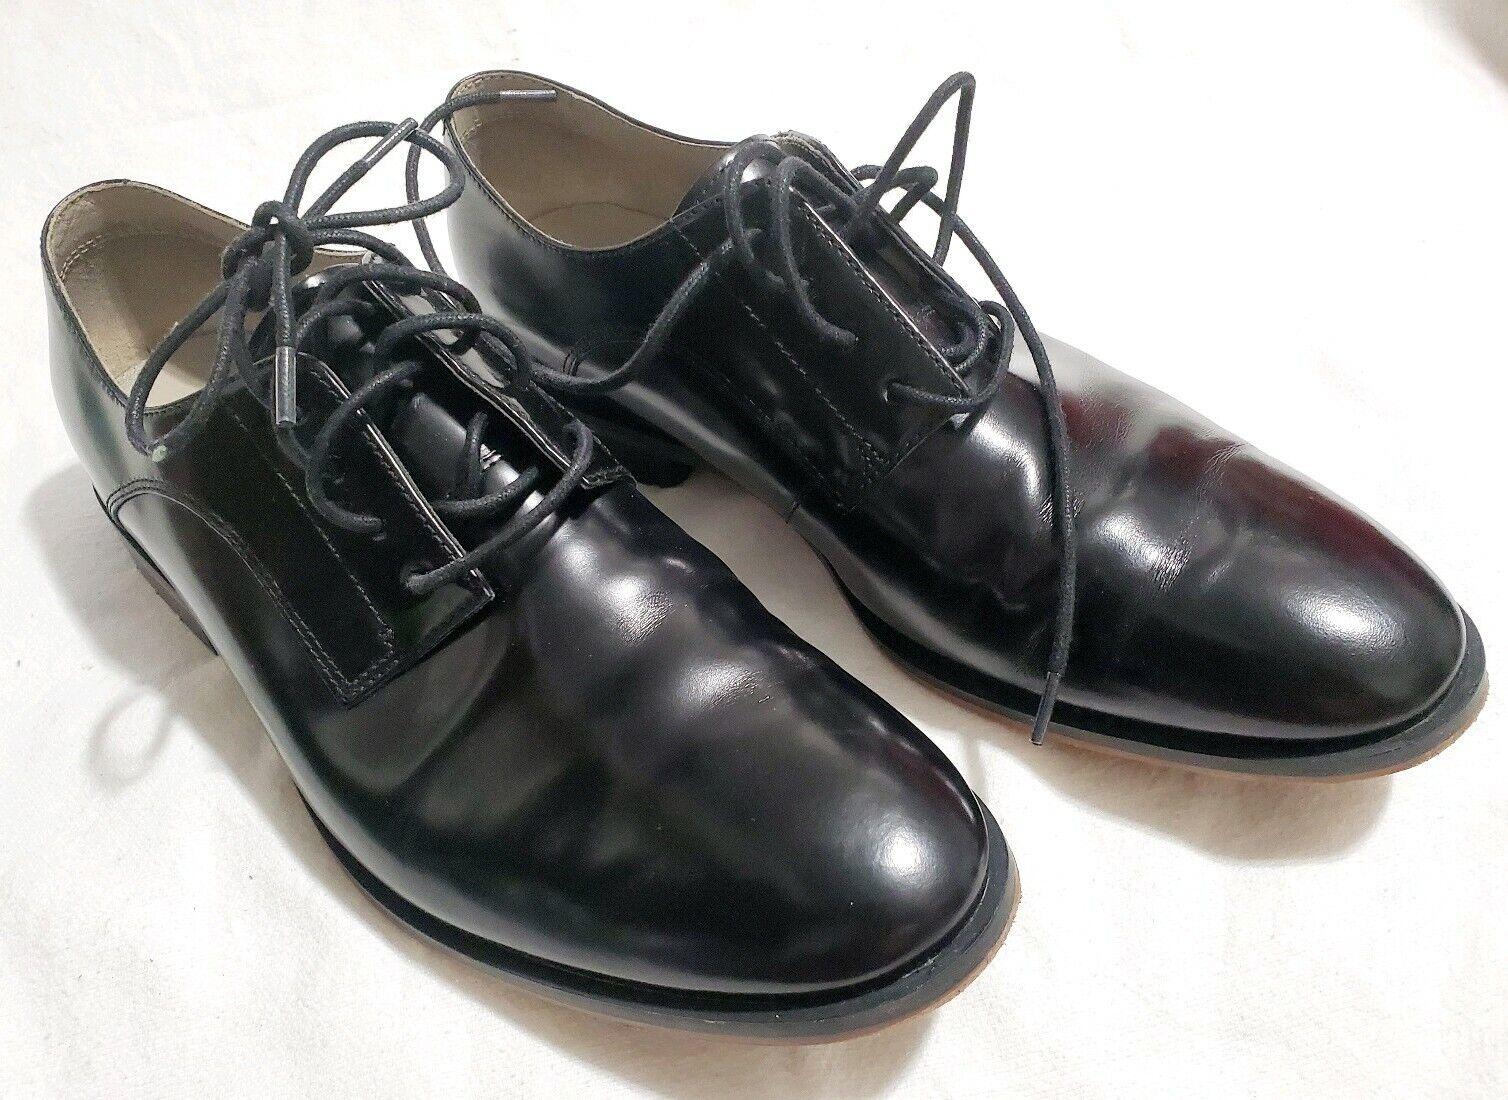 Black Clarks Leather Cuir black shoes Size 8.5 M